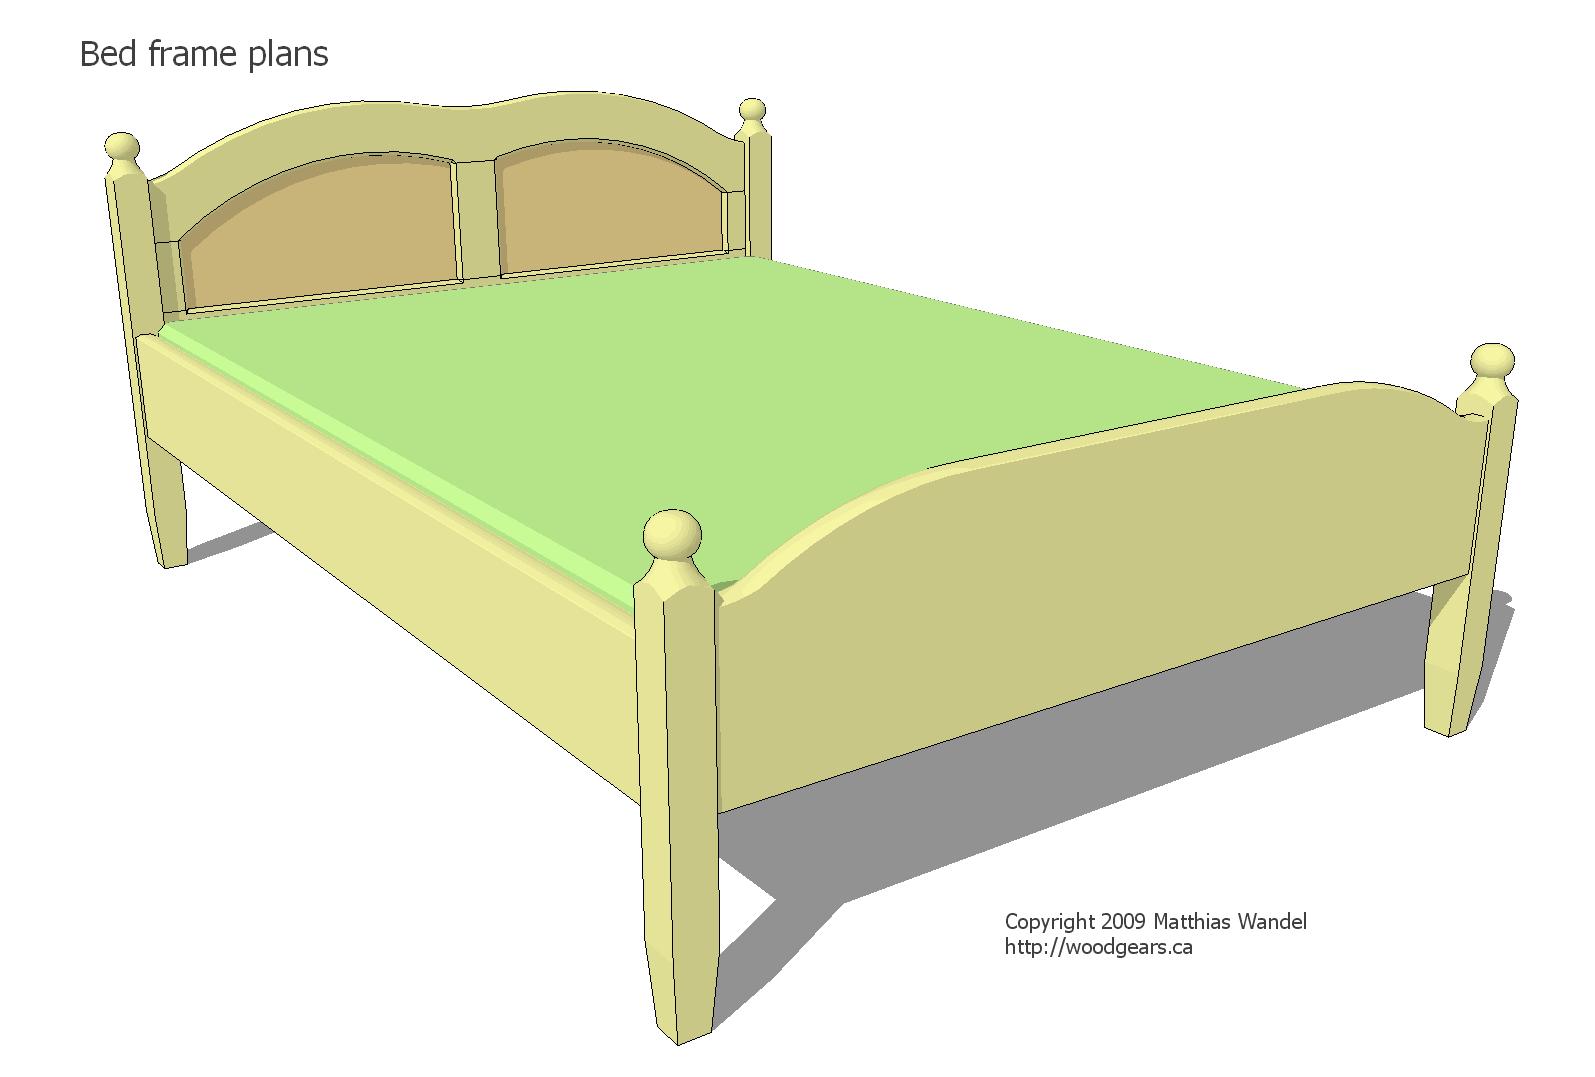 Wooden bed building plans queen plans pdf download free for Bed design plans